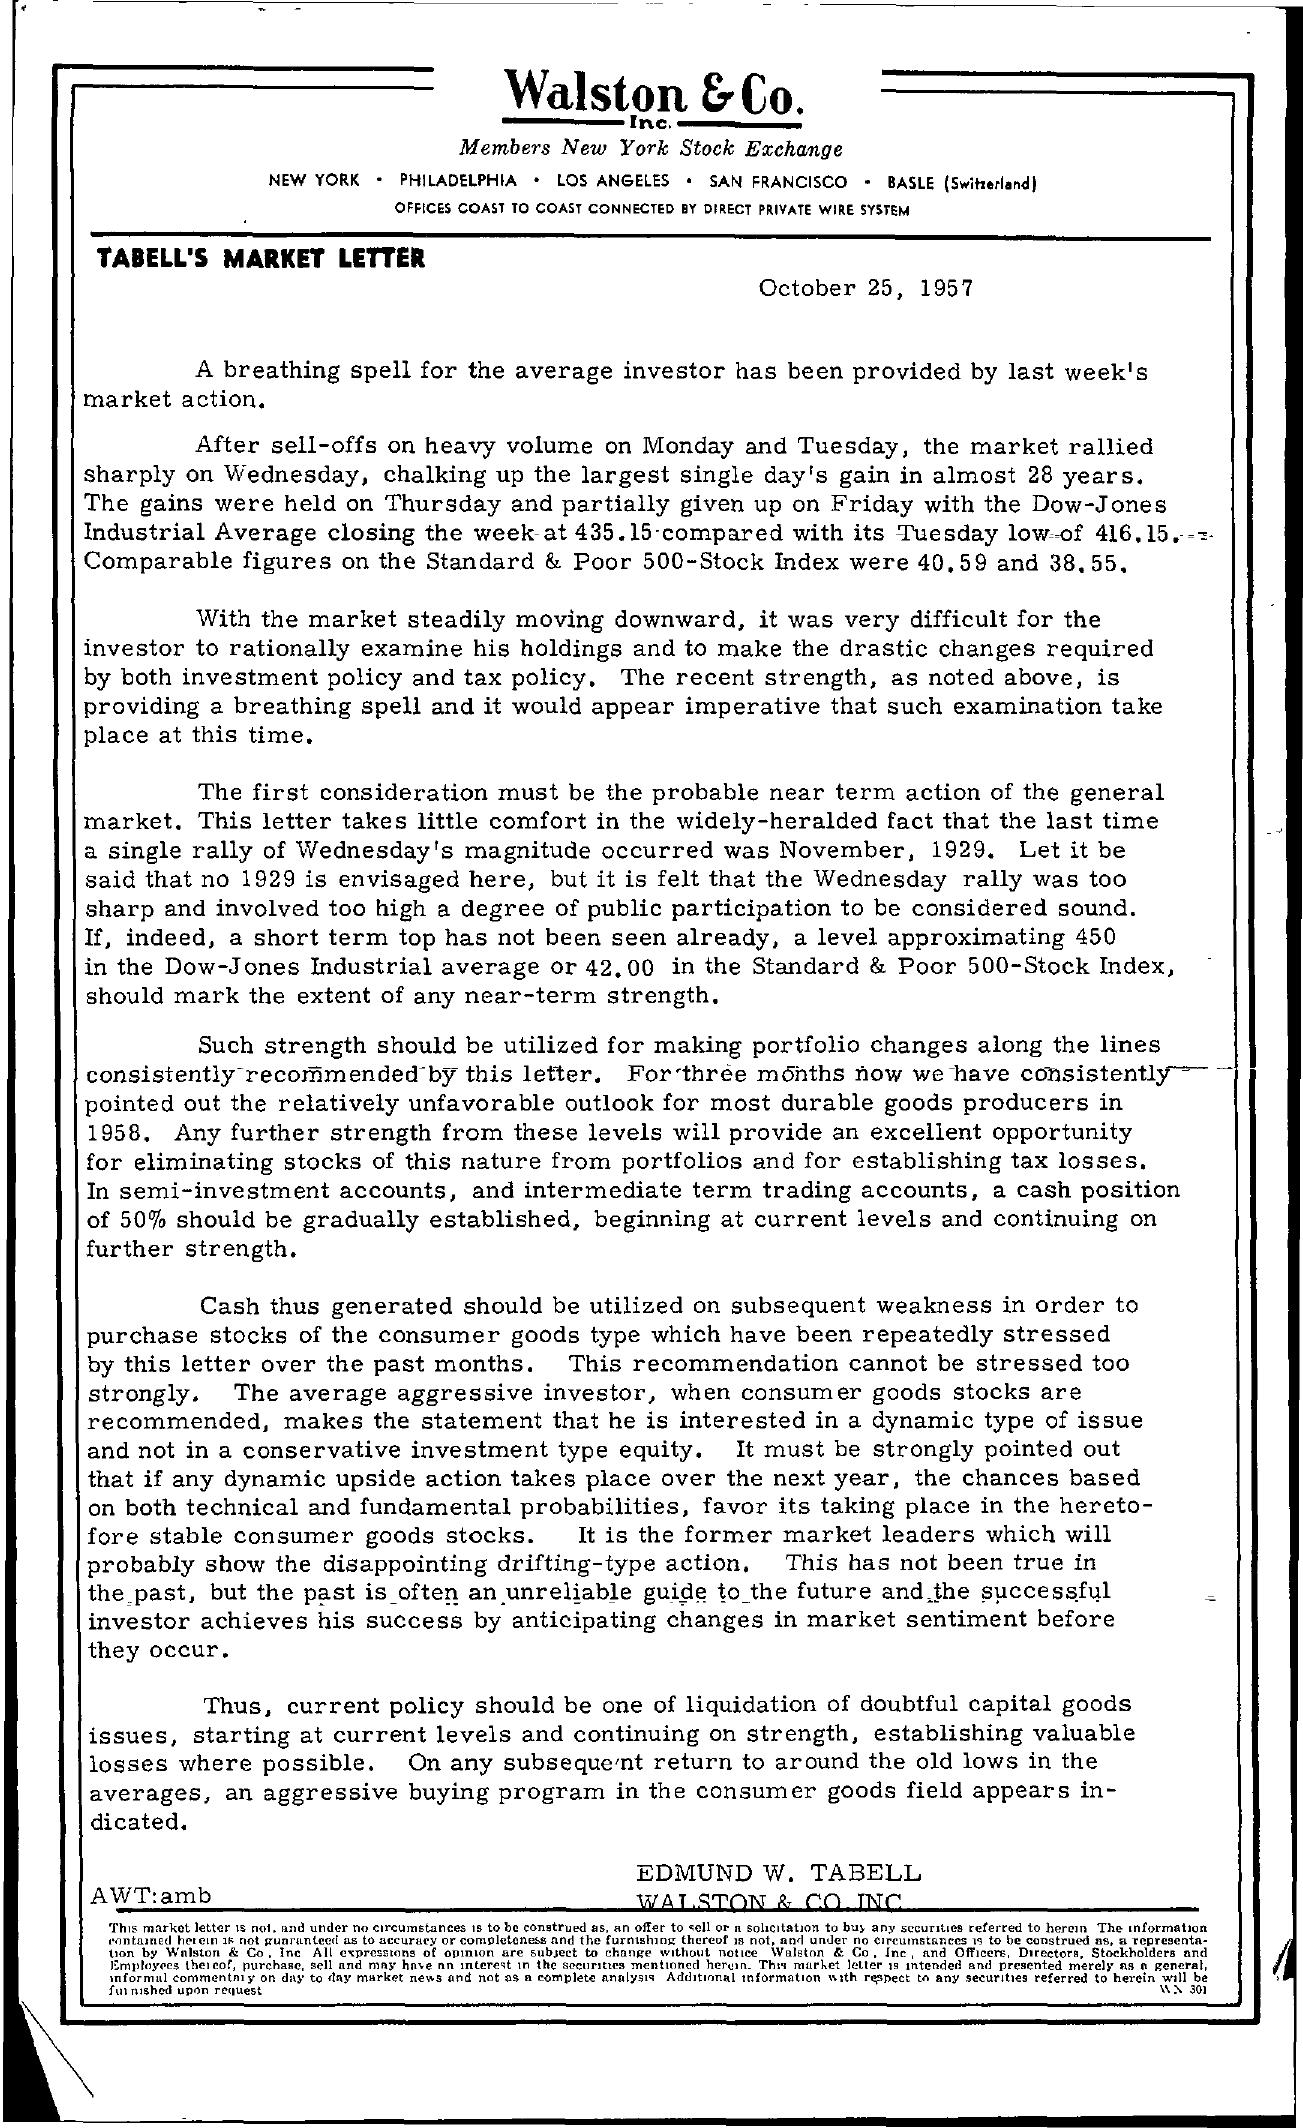 Tabell's Market Letter - October 25, 1957